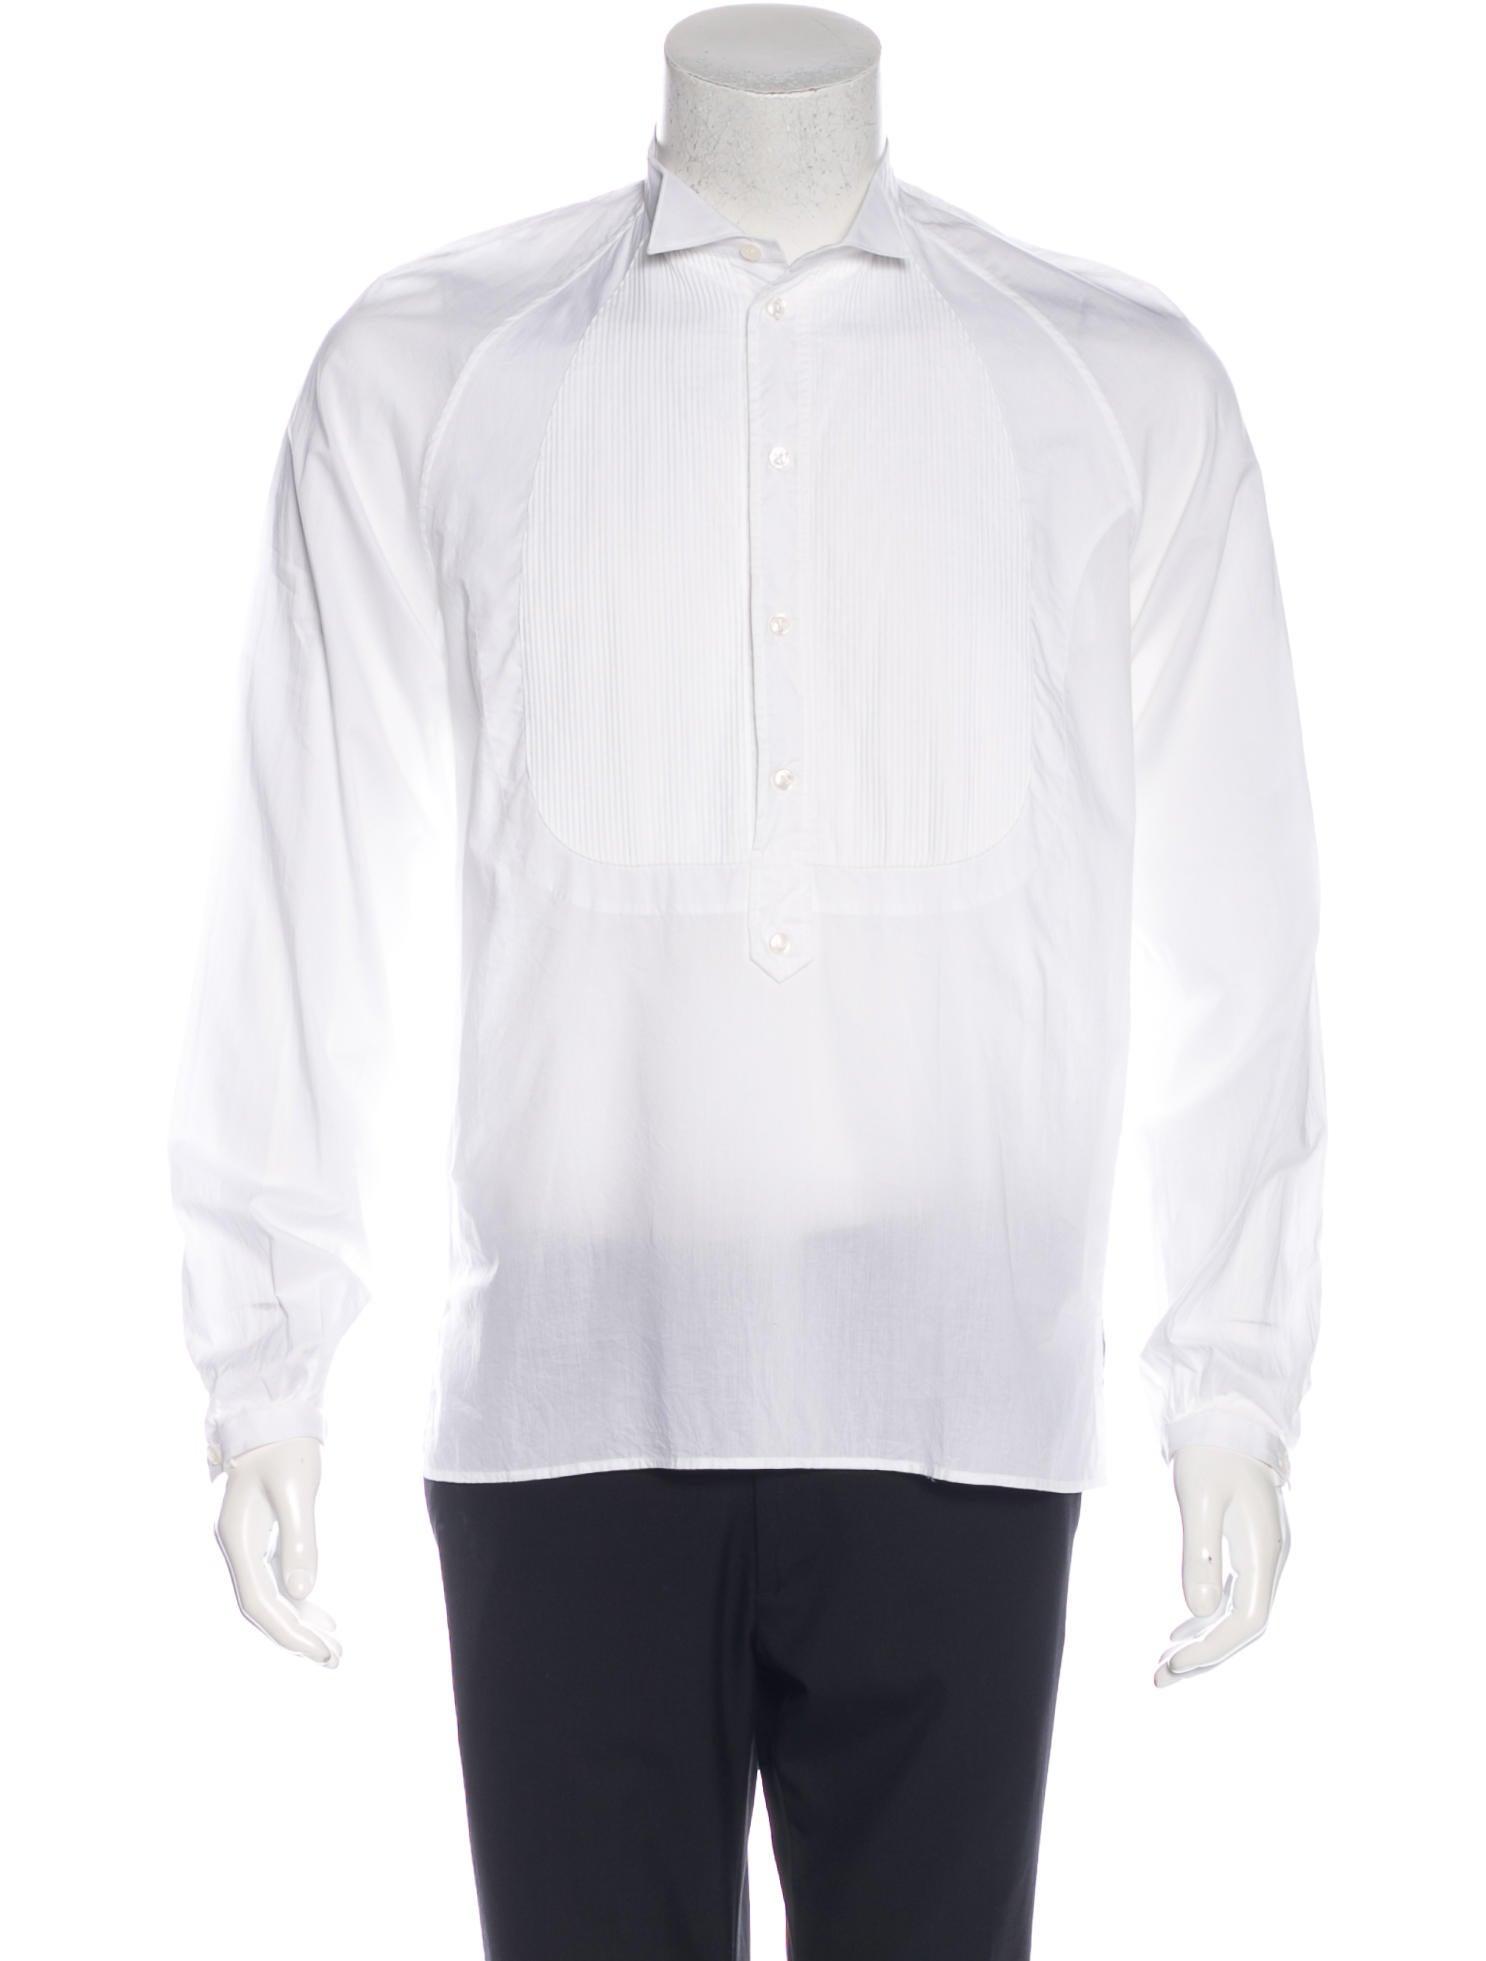 Yves saint laurent tuxedo dress shirt w tags clothing for Yves saint laurent white t shirt